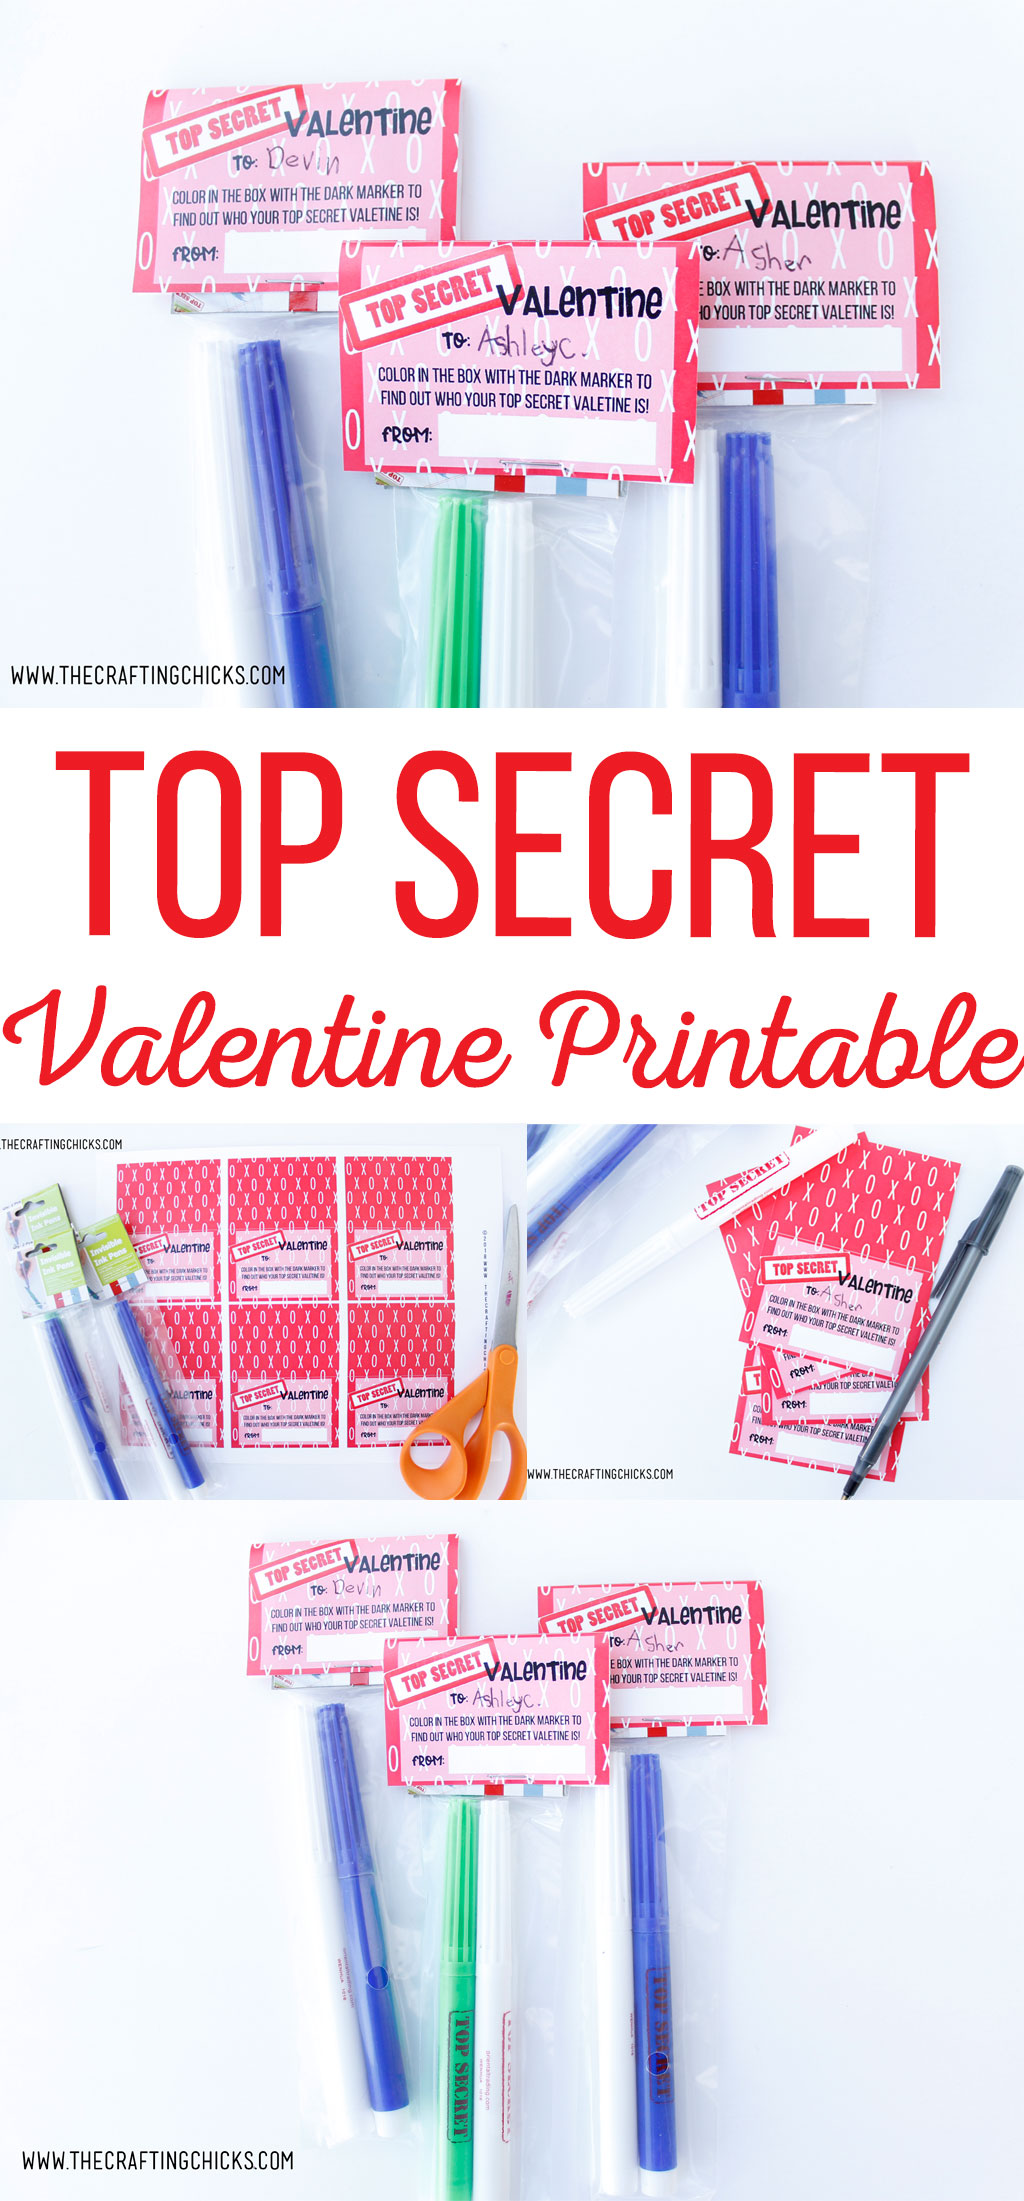 Top Secret Valentine Printable